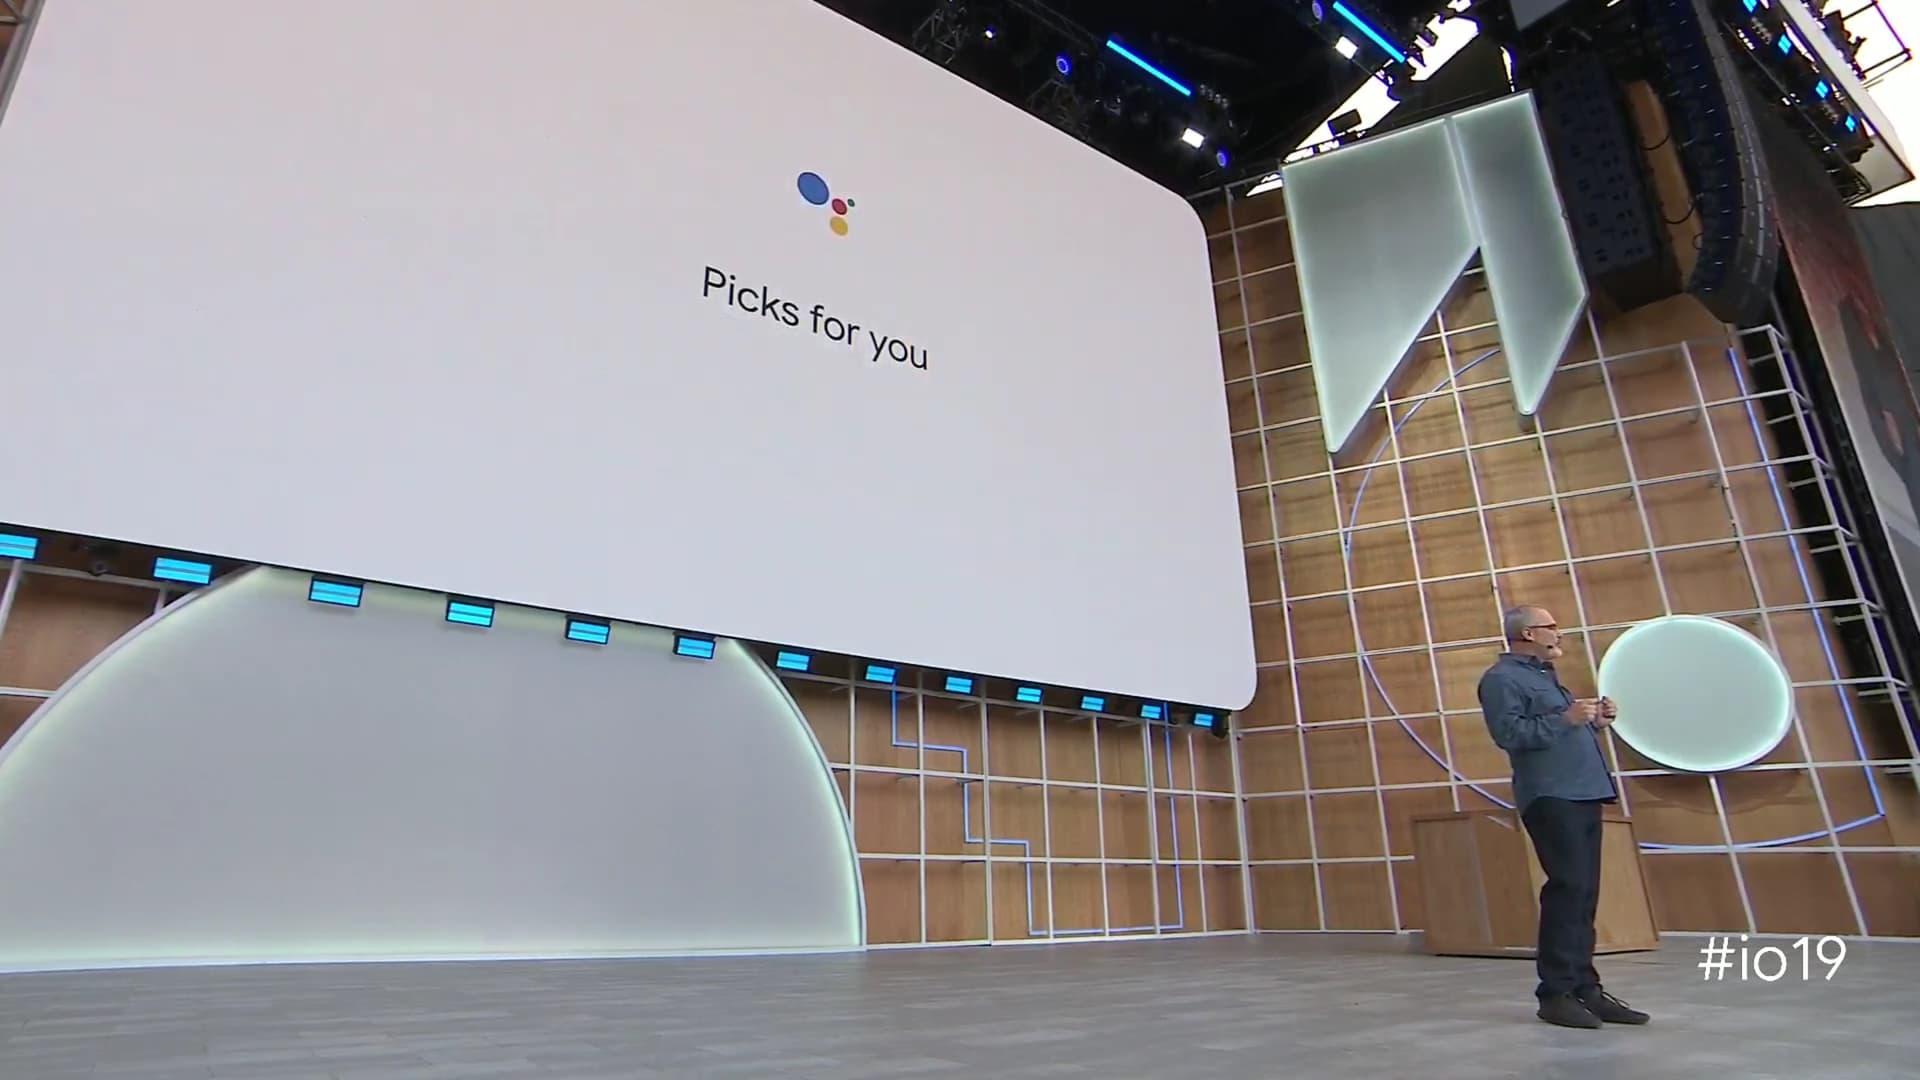 Scott shows off Pics for You at Google I/O 2019